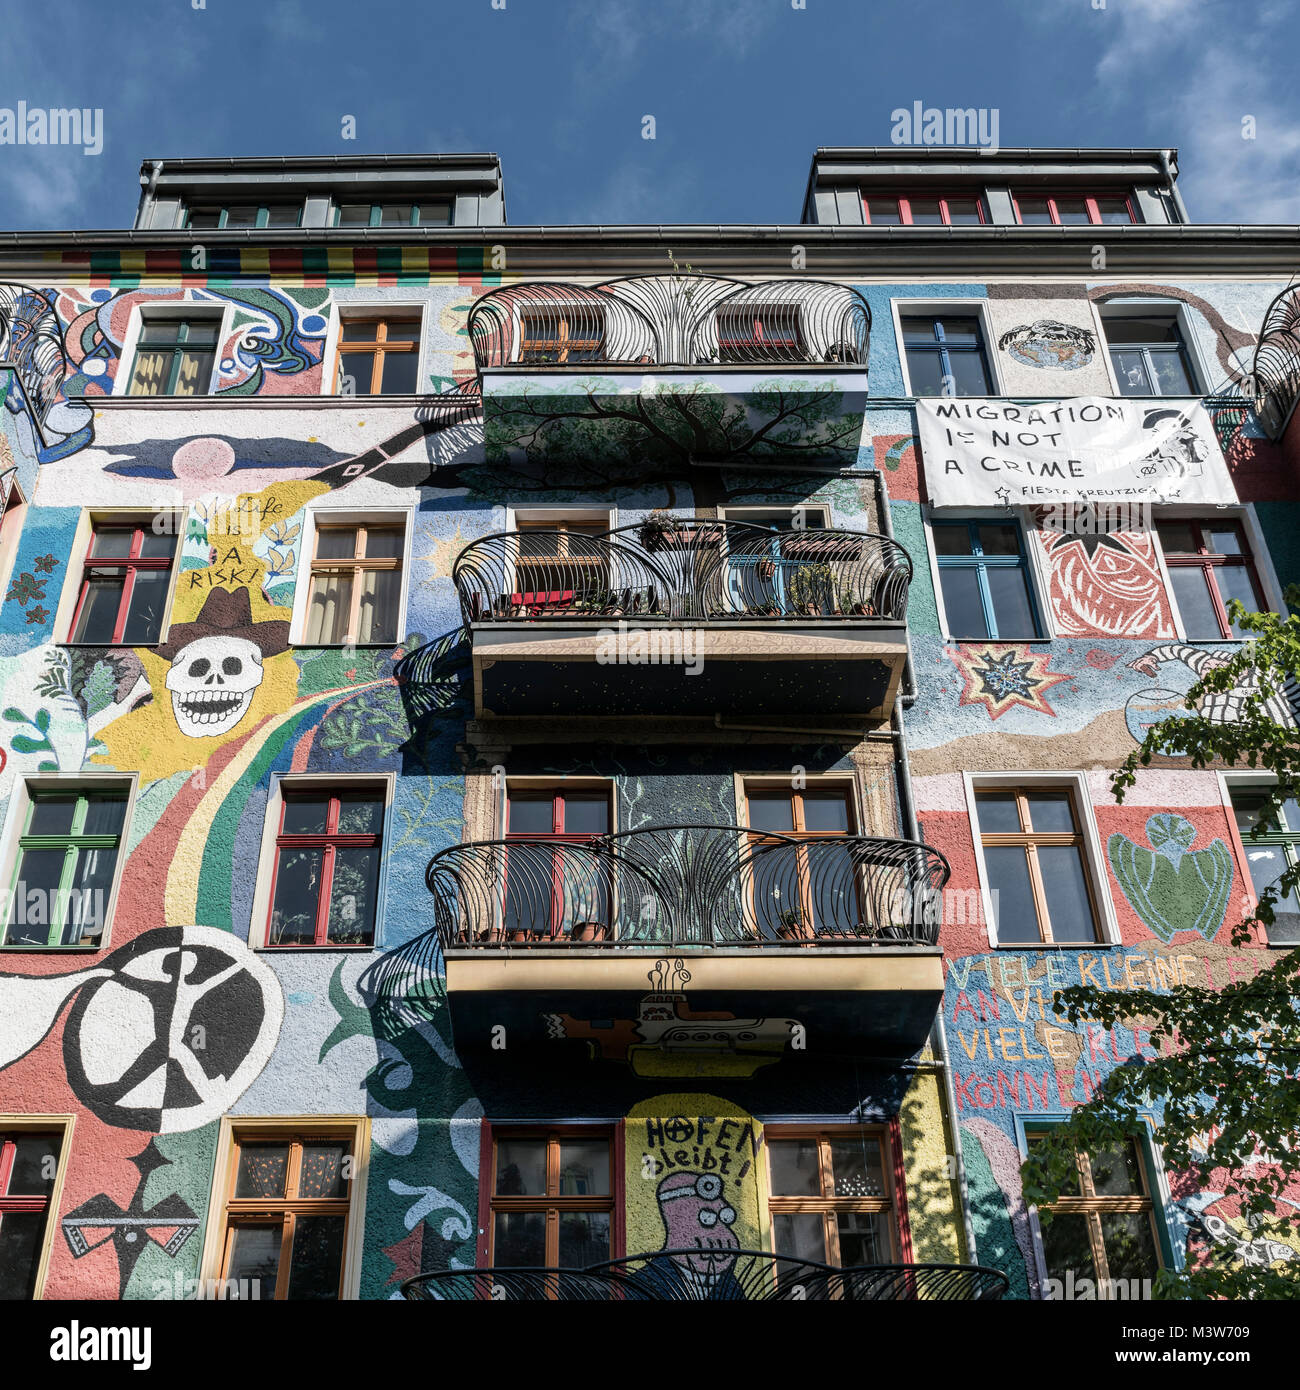 Wandmalerei stock photos wandmalerei stock images alamy - Wandmalerei berlin ...